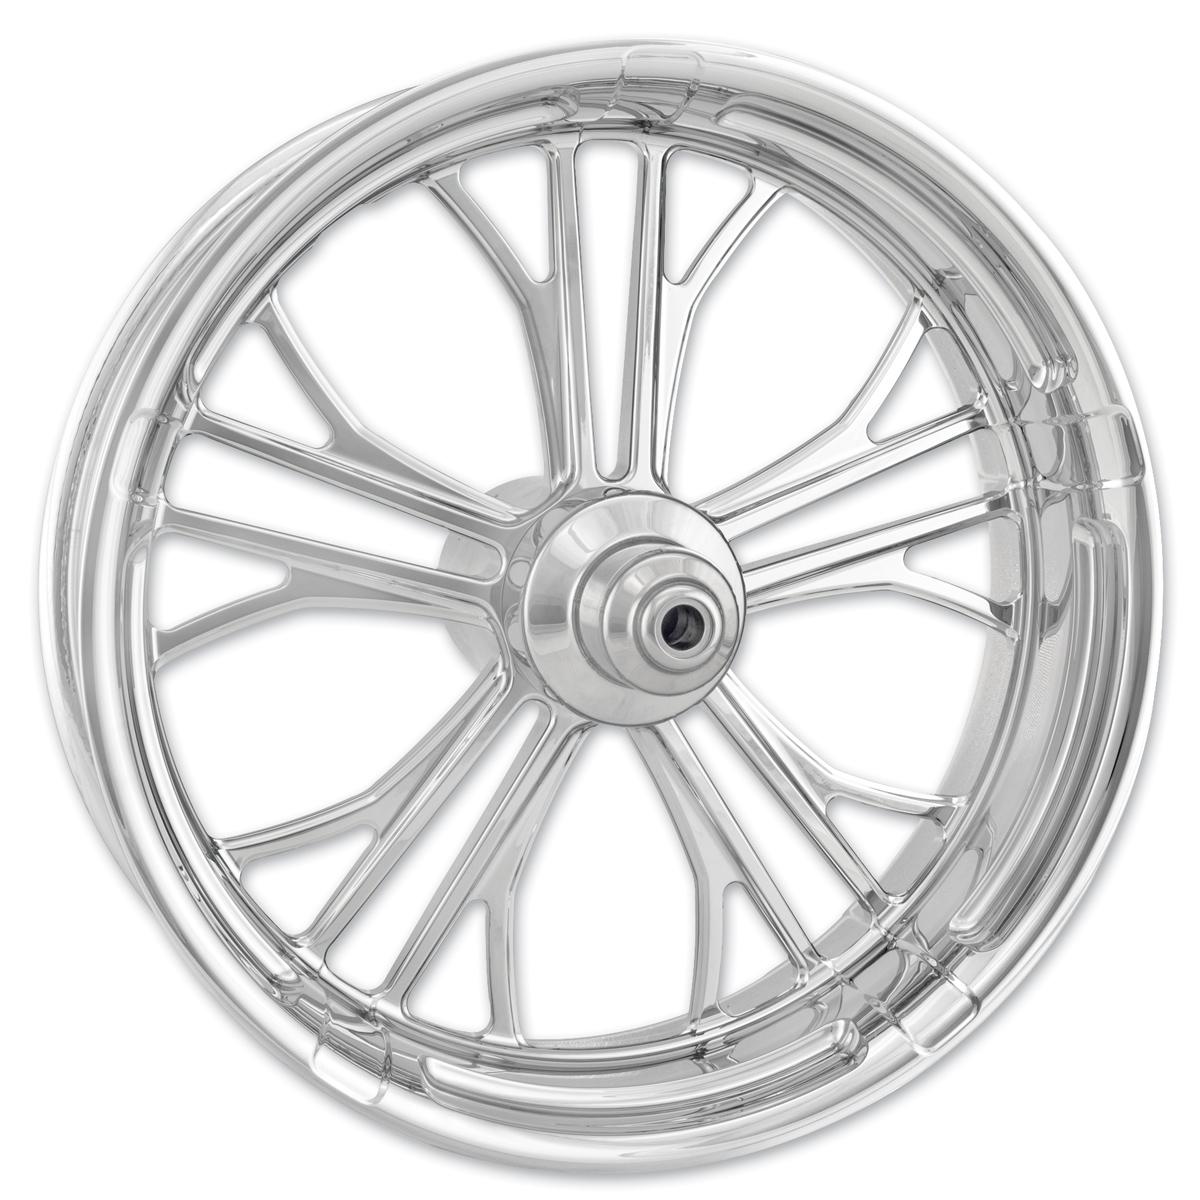 Performance Machine Dixon Chrome Front Wheel 18x3.5